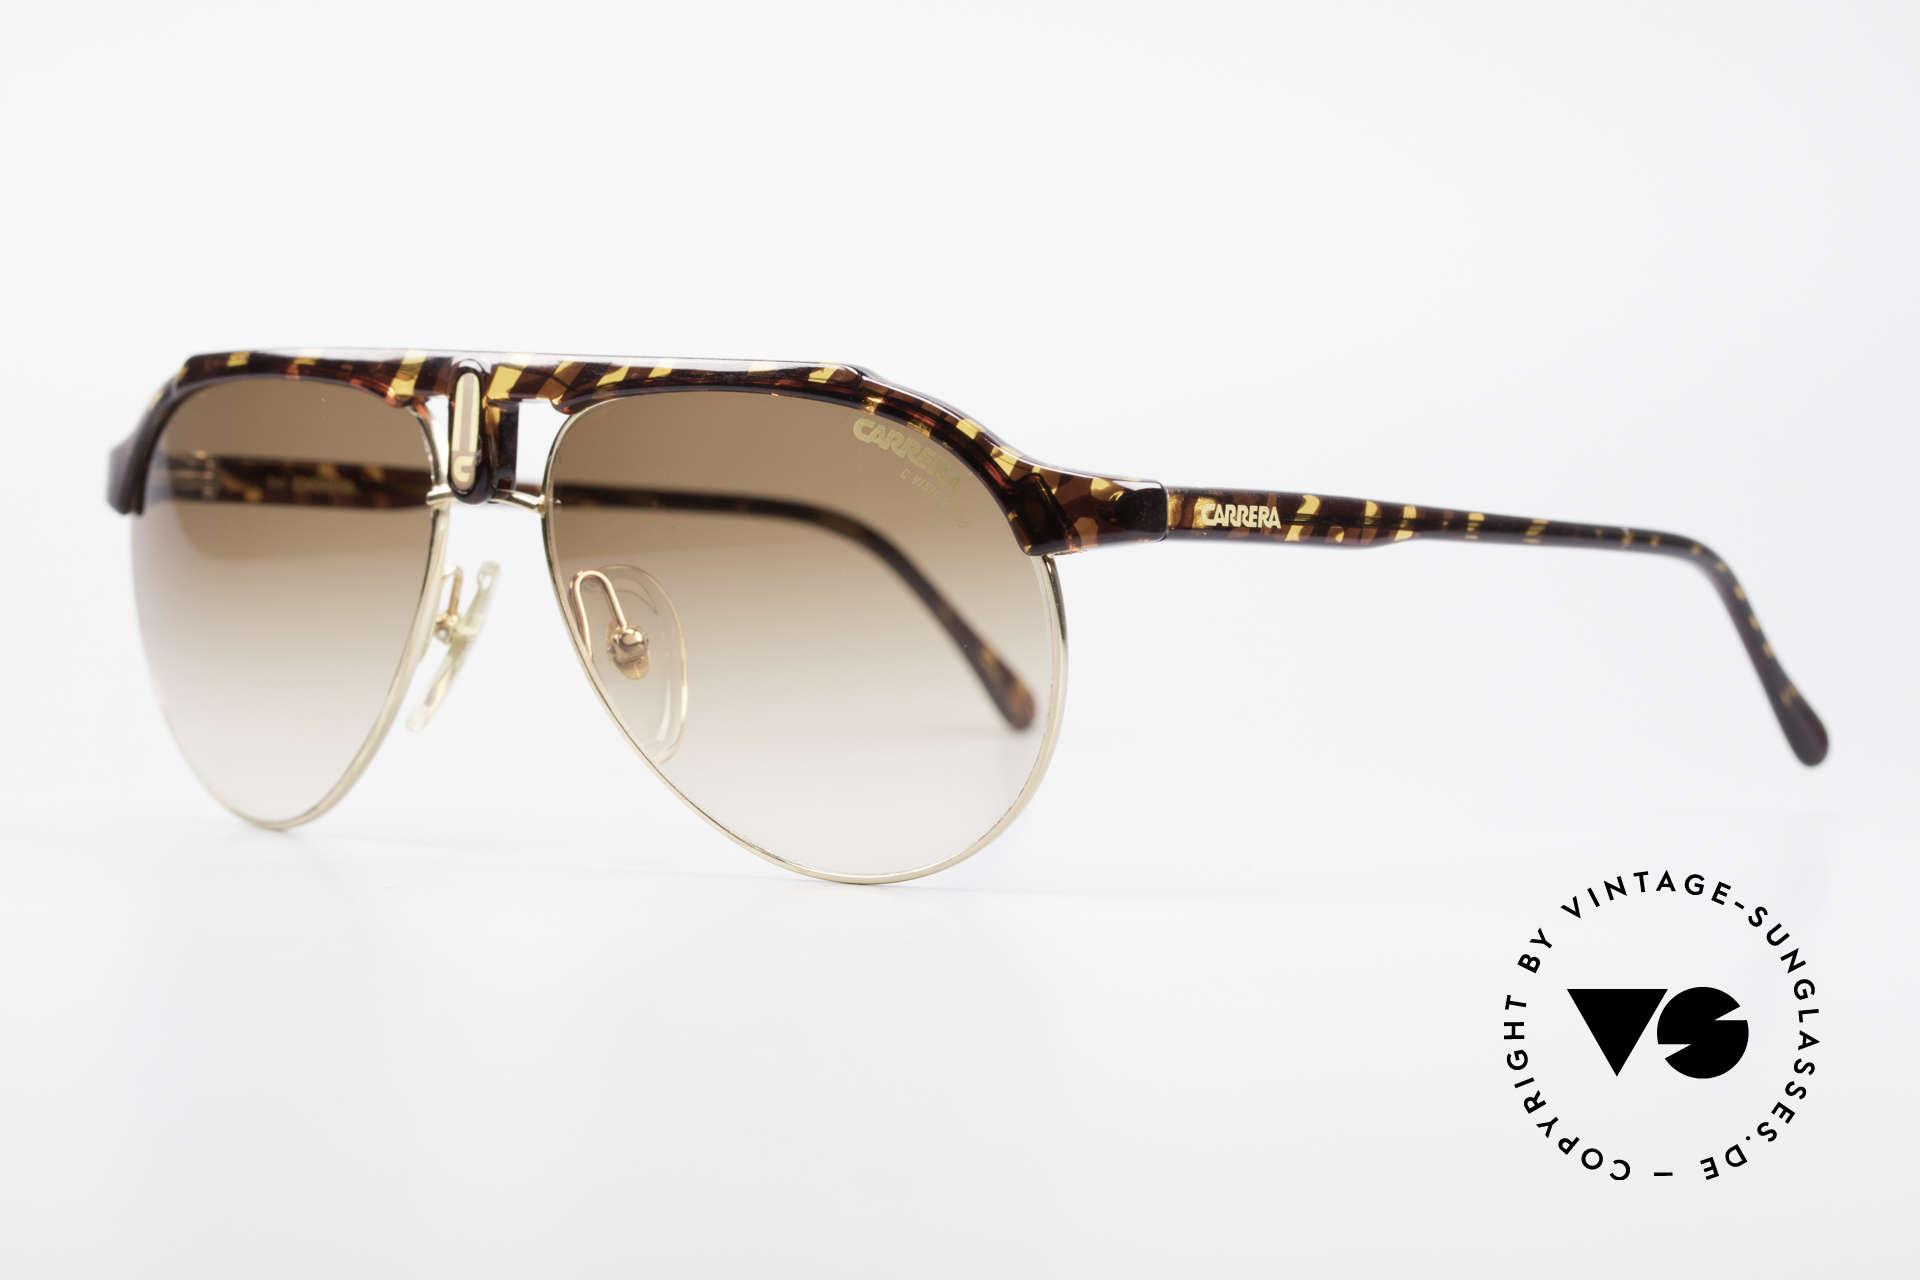 Carrera 5478 Rare Vintage Shades Aviator, brown-gradient CARRERA C-VISION sun lenses, Made for Men and Women